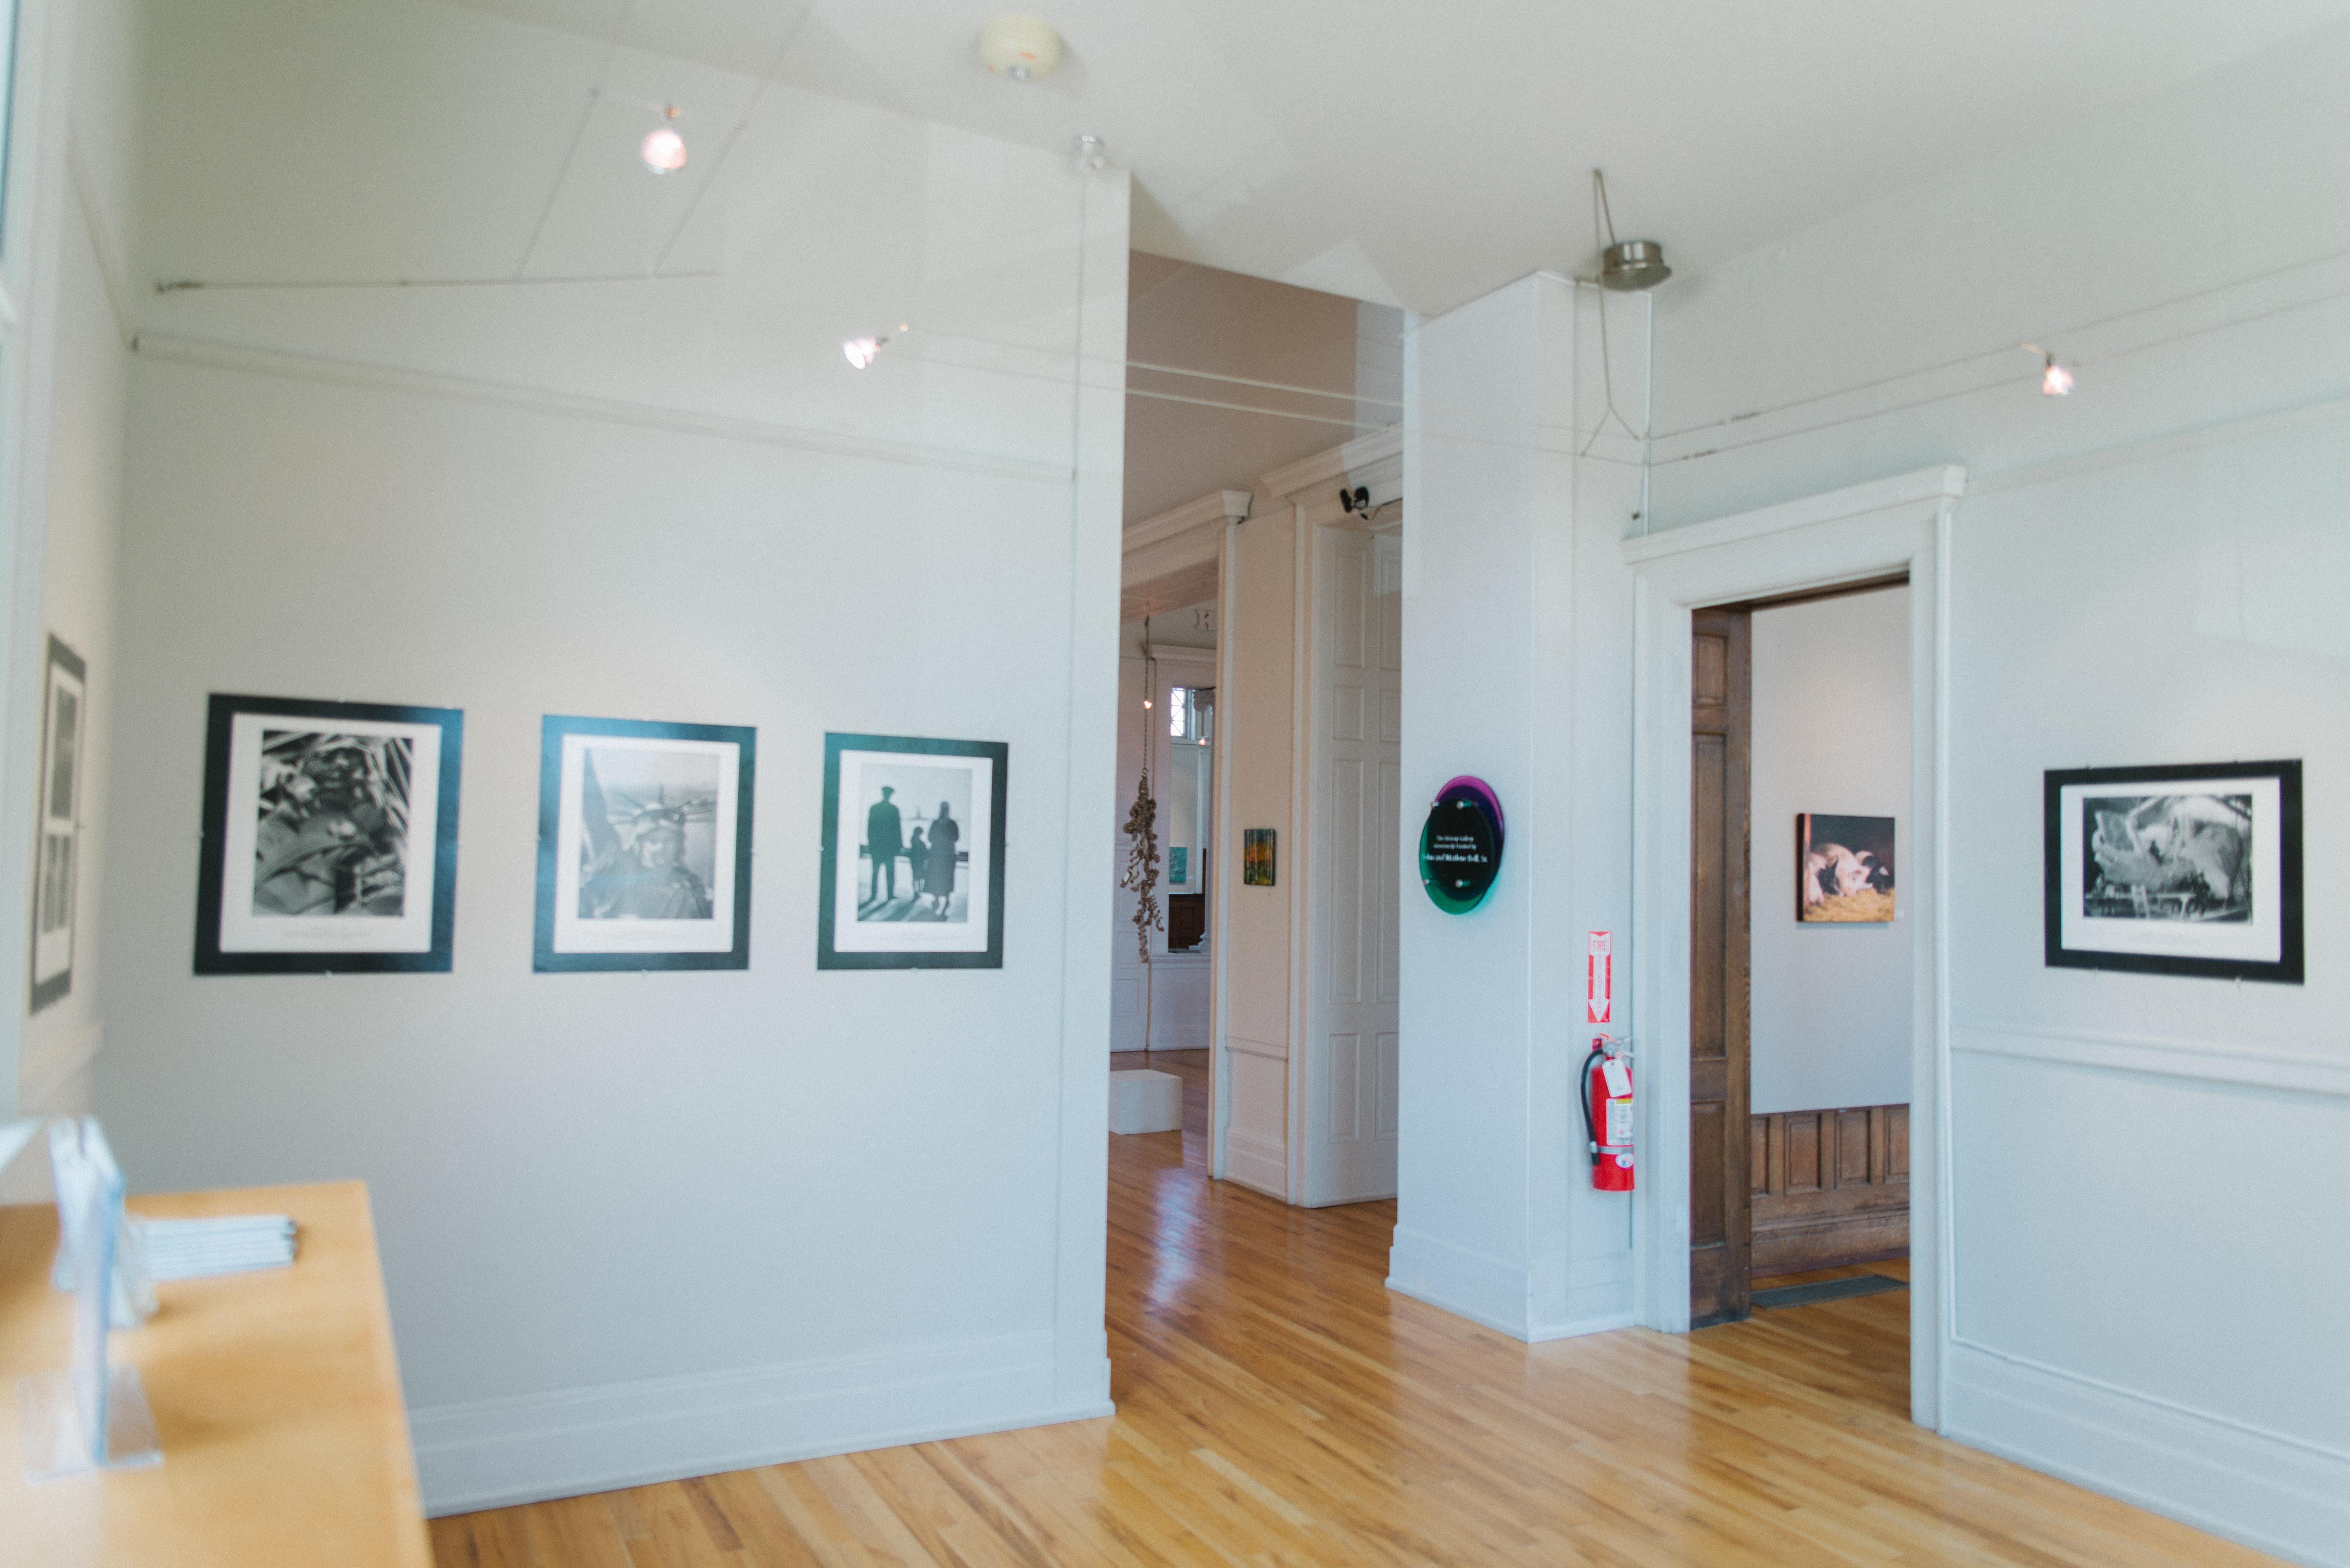 Boll History Gallery 2